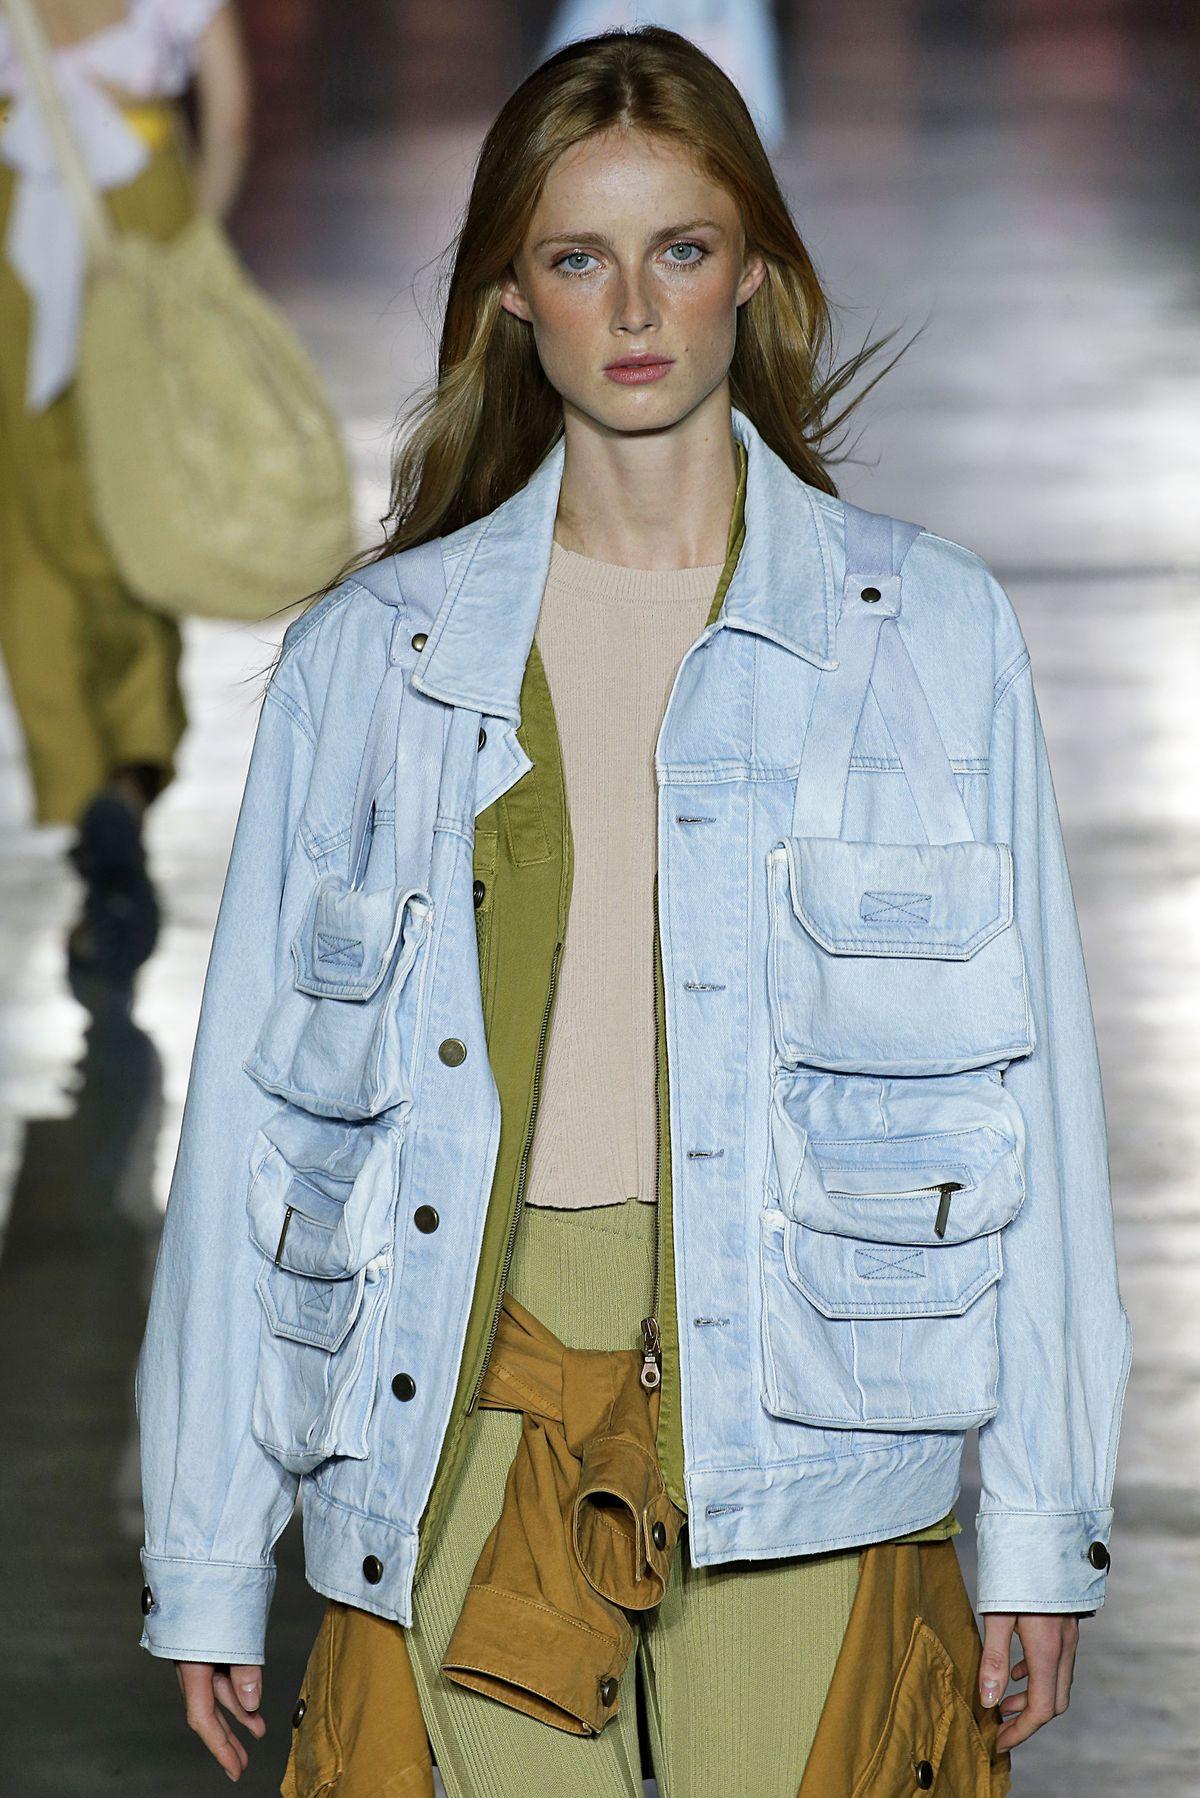 A model wears a blue denim jacket with three pockets on each breast.